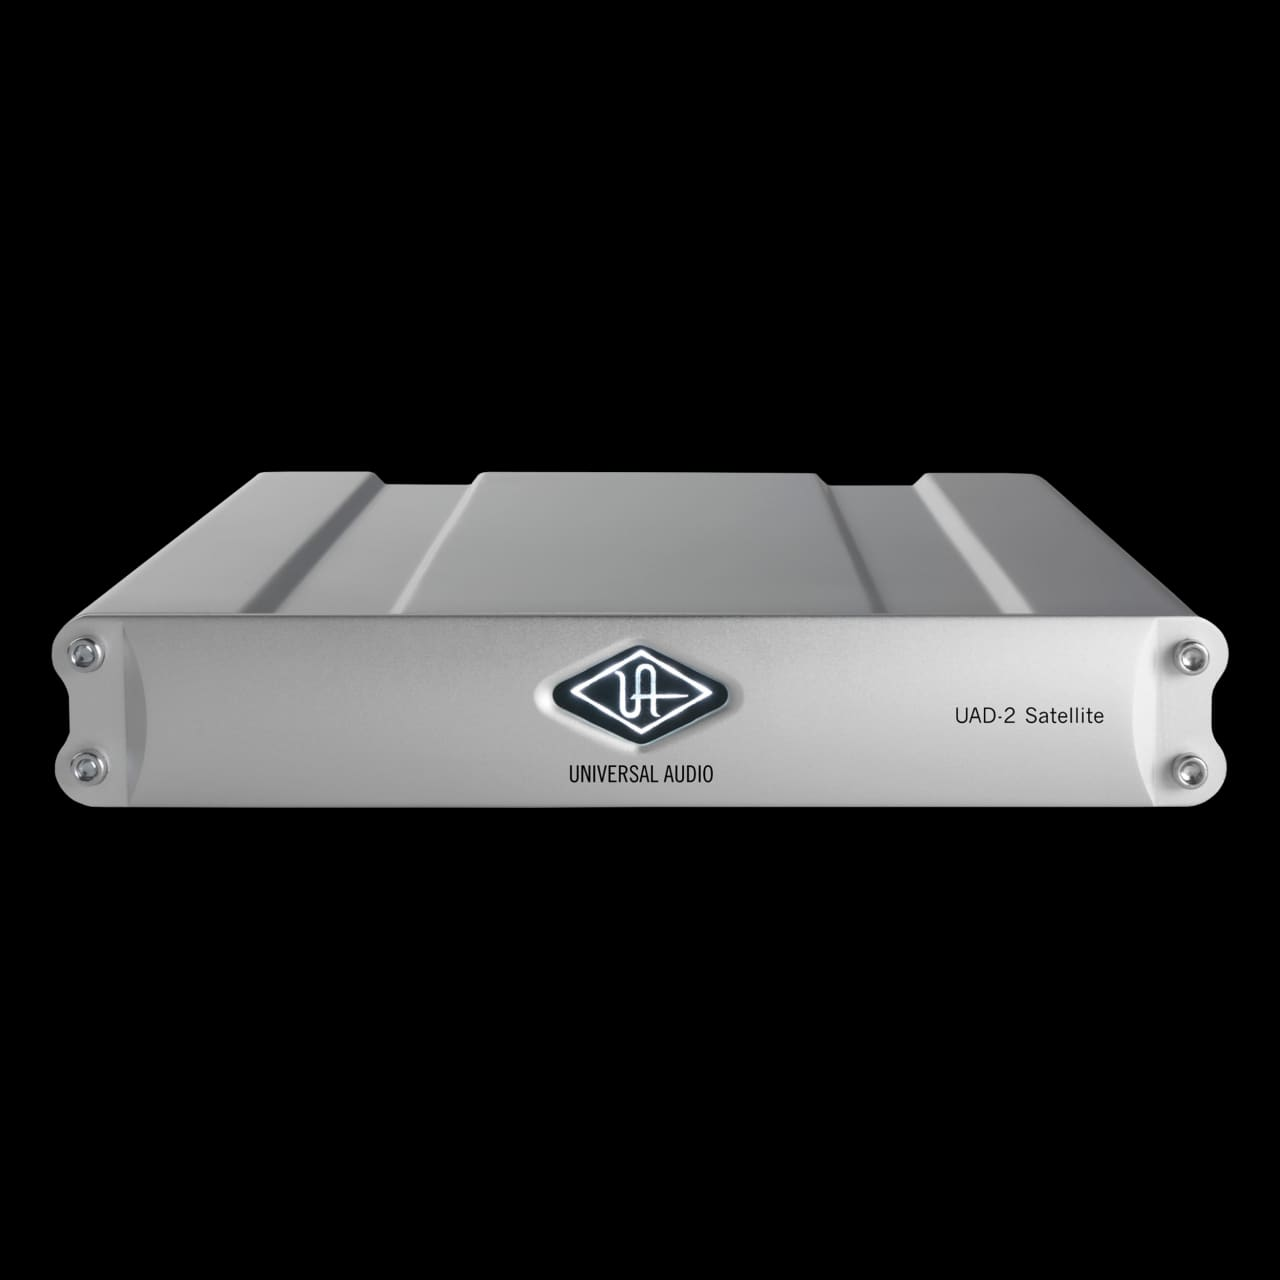 universal audio uad 2 firewire satellite quad alto music reverb. Black Bedroom Furniture Sets. Home Design Ideas